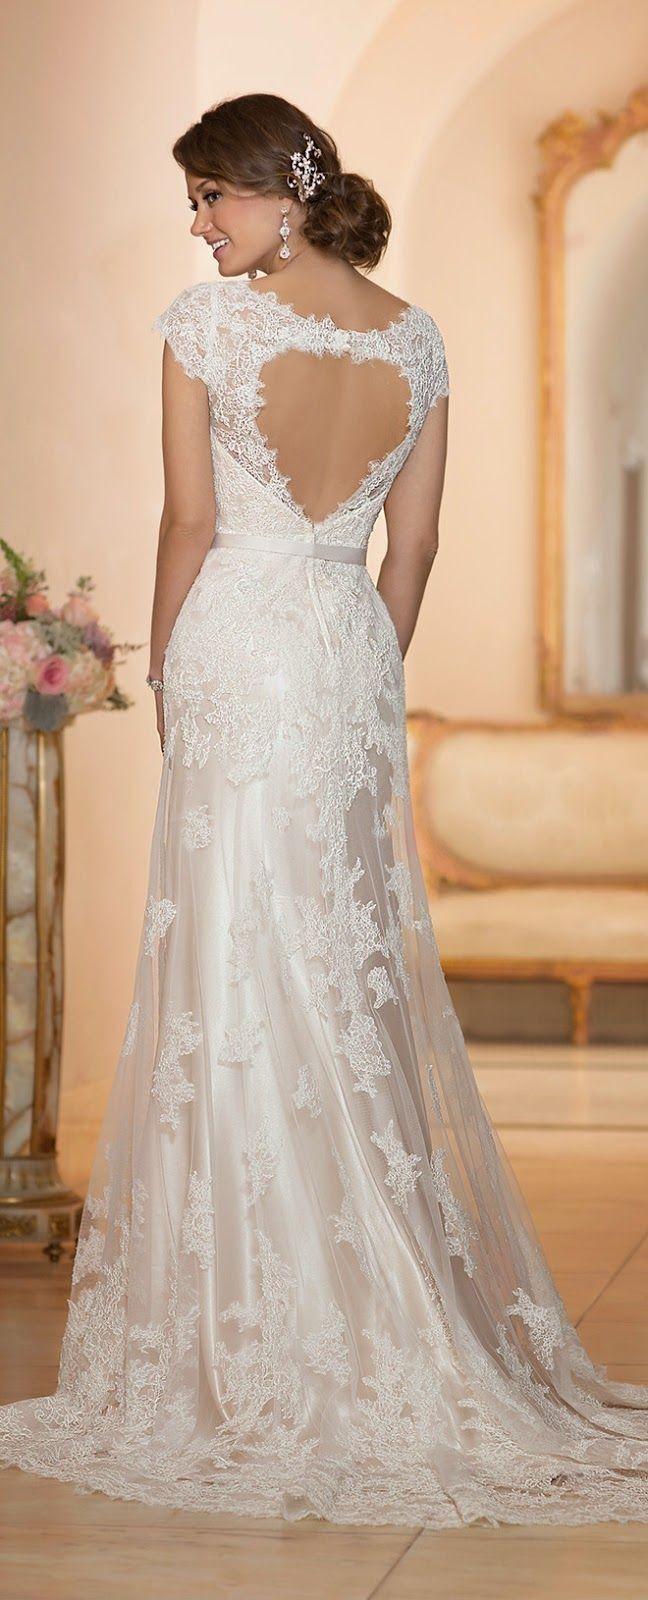 Stella York Spring 2015 Bridal Collection - Belle the Magazine . The Wedding Blog For The Sophisticated Bride wedding dress #weddingdress